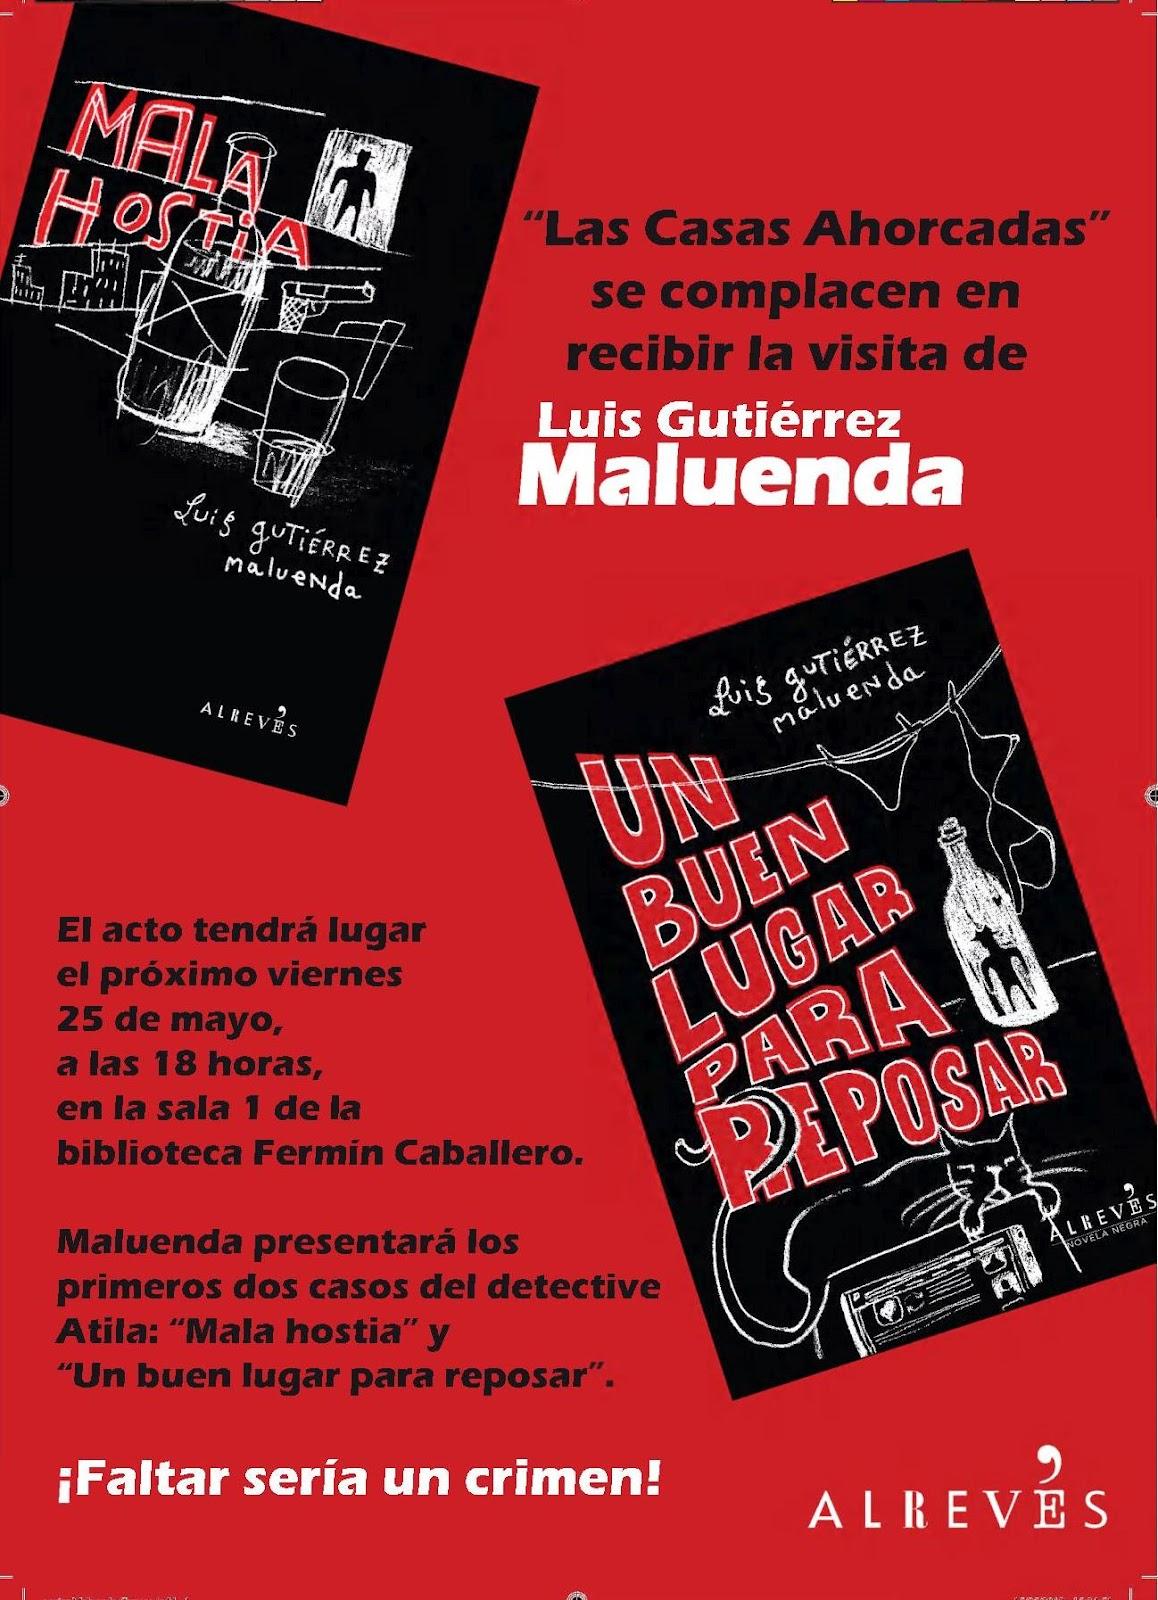 http://4.bp.blogspot.com/-s1TLph8kOoo/T7PX9onb_ZI/AAAAAAAAKNc/0skO_PCieIo/s1600/poster+Maluenda+Cuenca-page-001.jpg